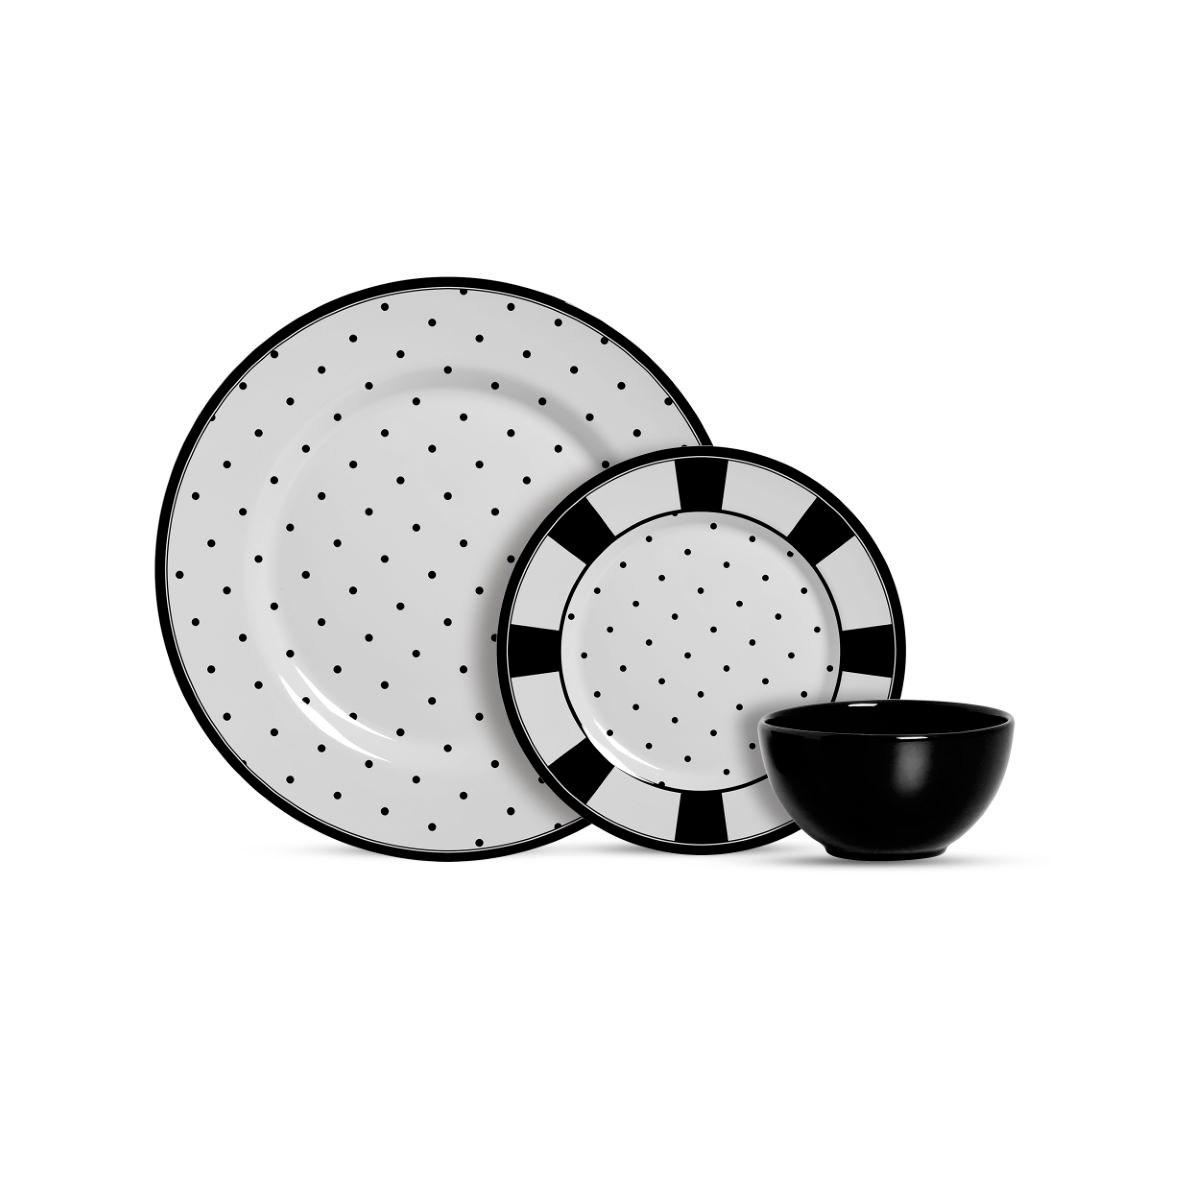 Aparelho De Jantar Cerâmica Petit Pois 12 Pç